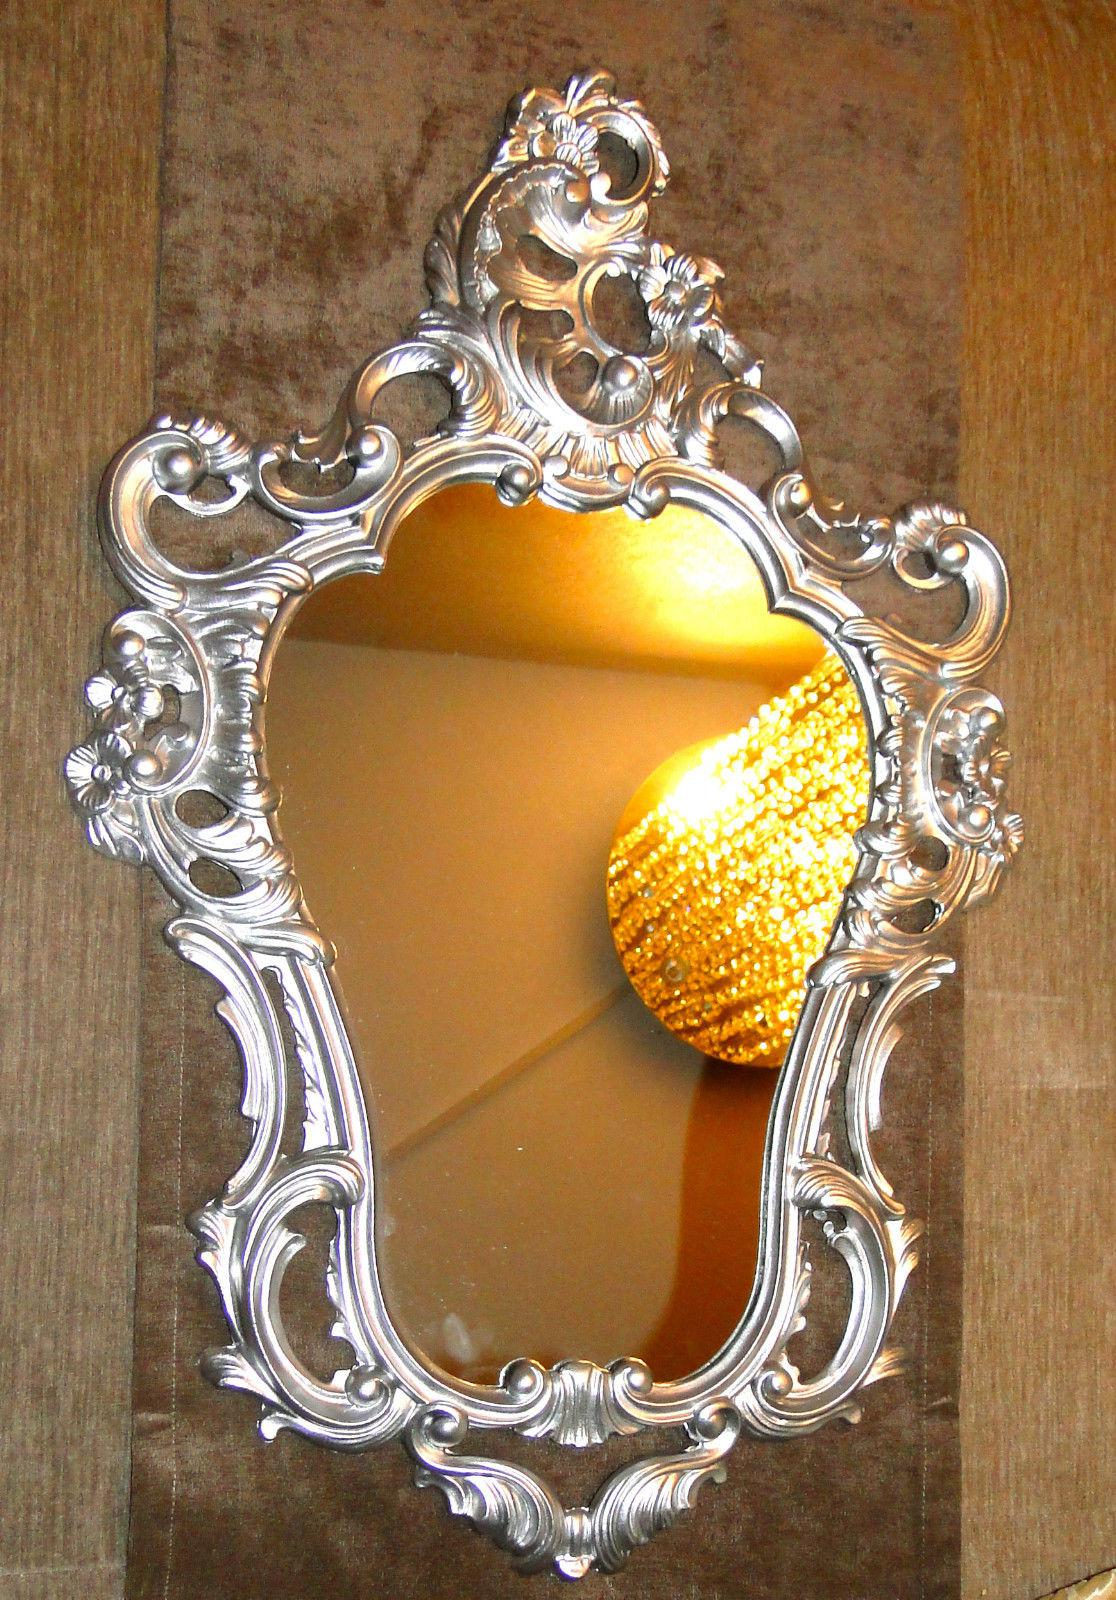 wandspiegel oval 76x50 spiegel barock antik badspiegel. Black Bedroom Furniture Sets. Home Design Ideas